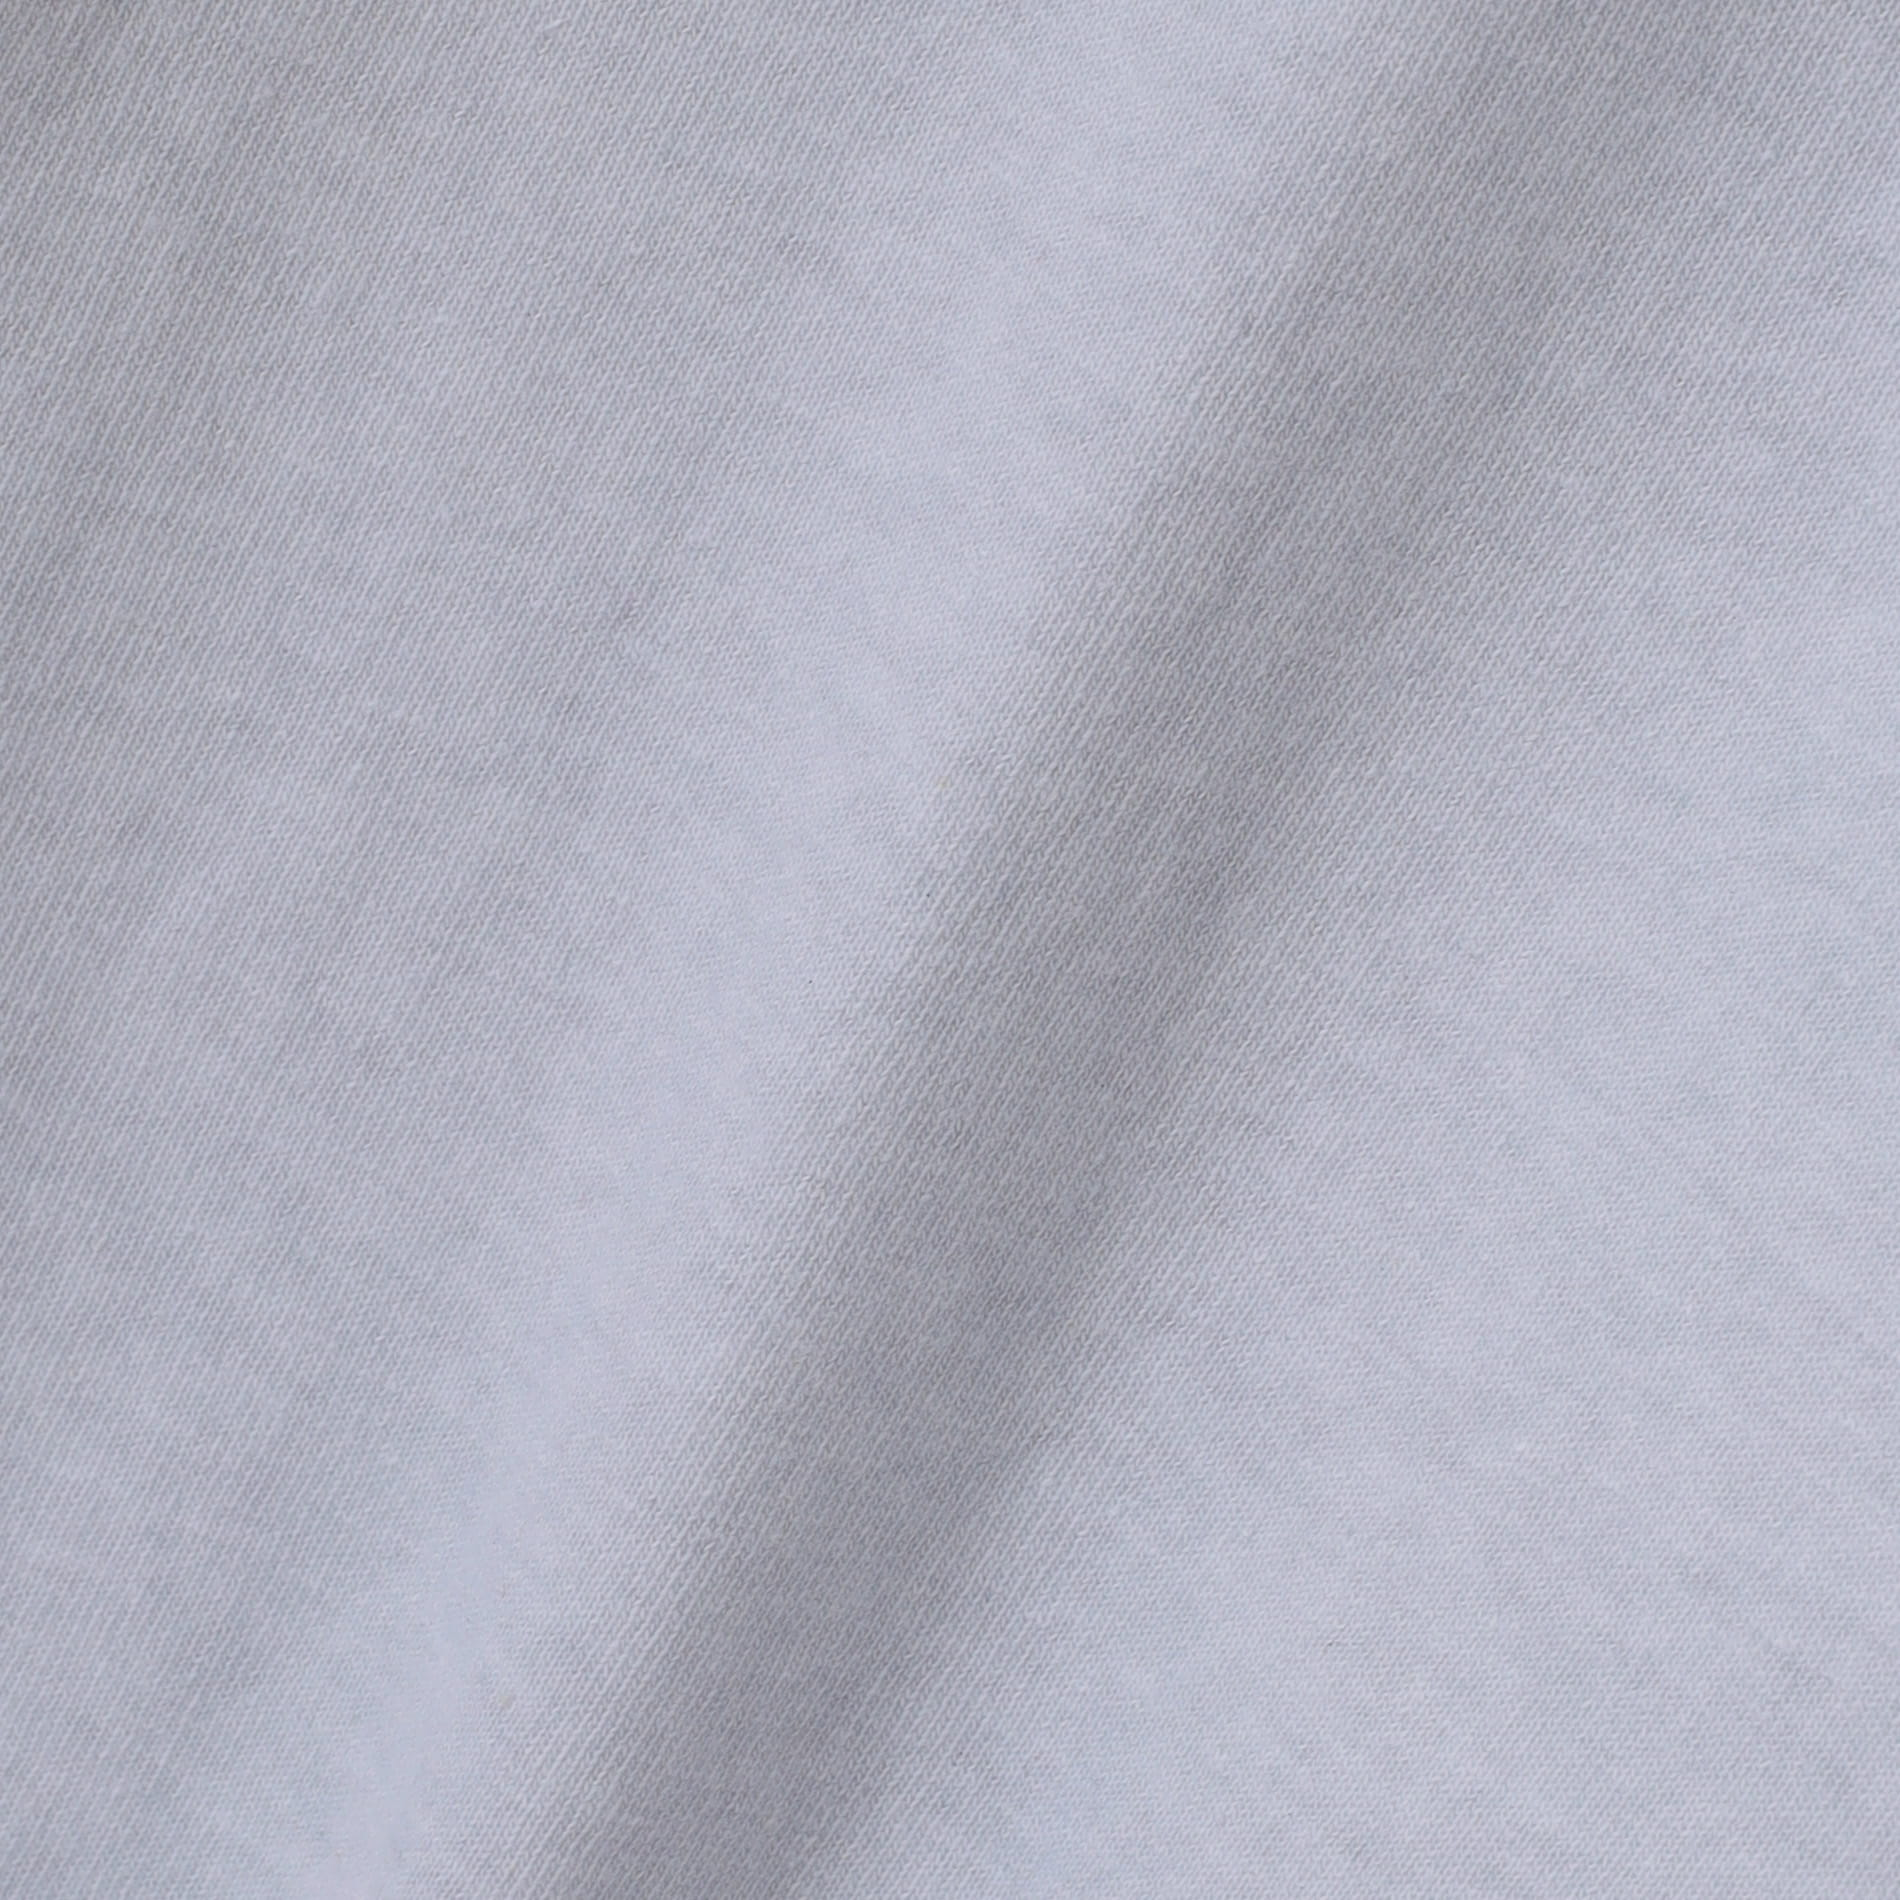 【NOMA t.d.】MEN Tシャツ Drawing Tee TS 01